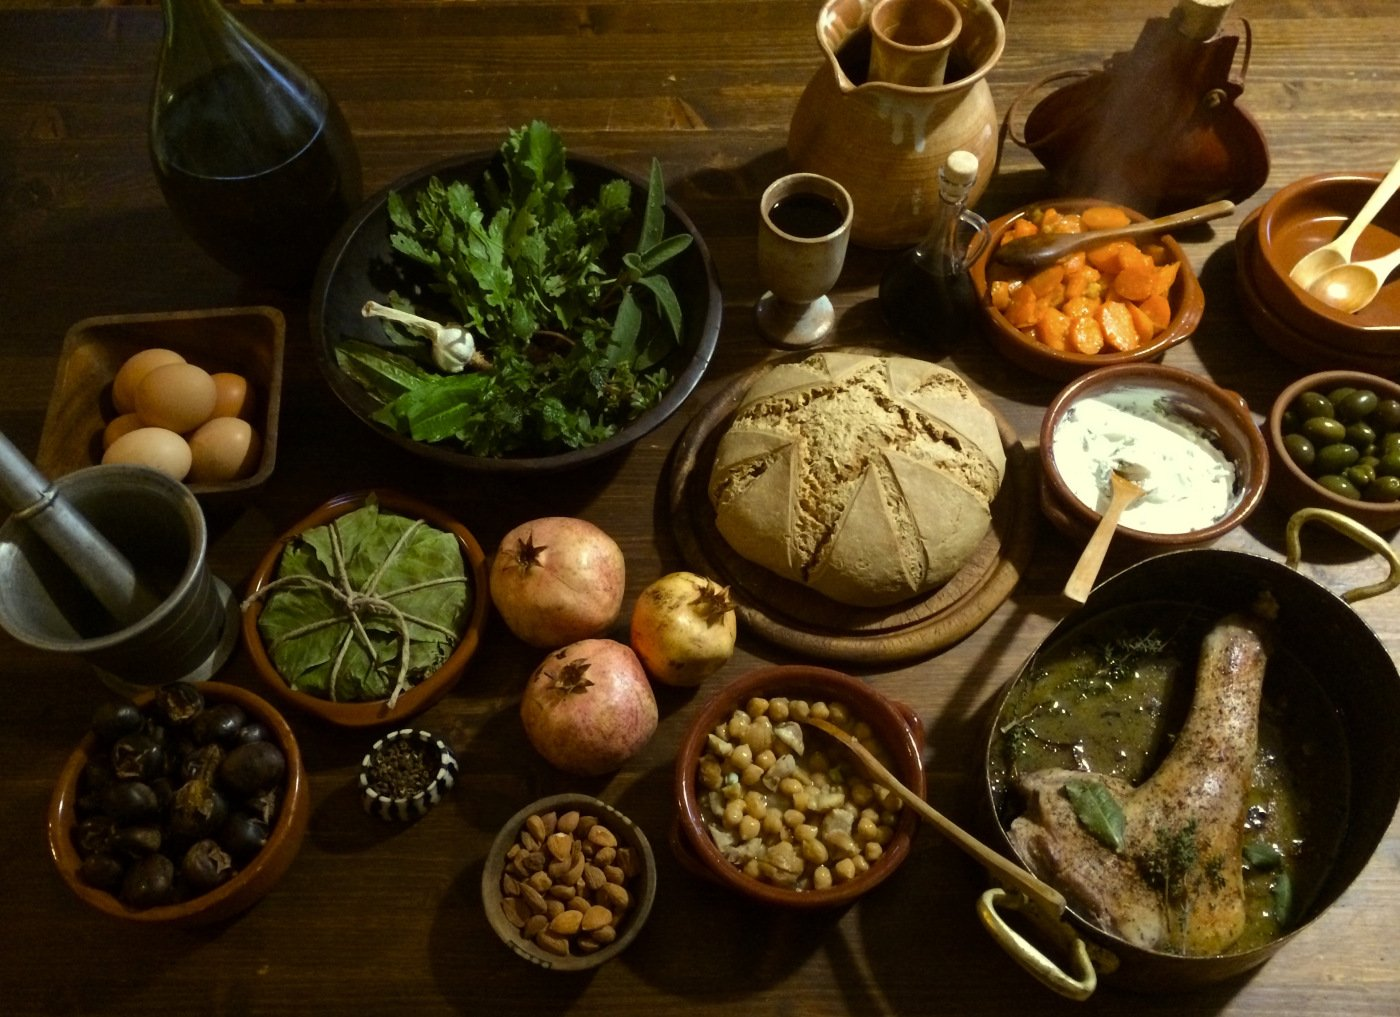 La cucina romana ieri vs oggi la cucina romana ieri vs oggi for La cucina romana